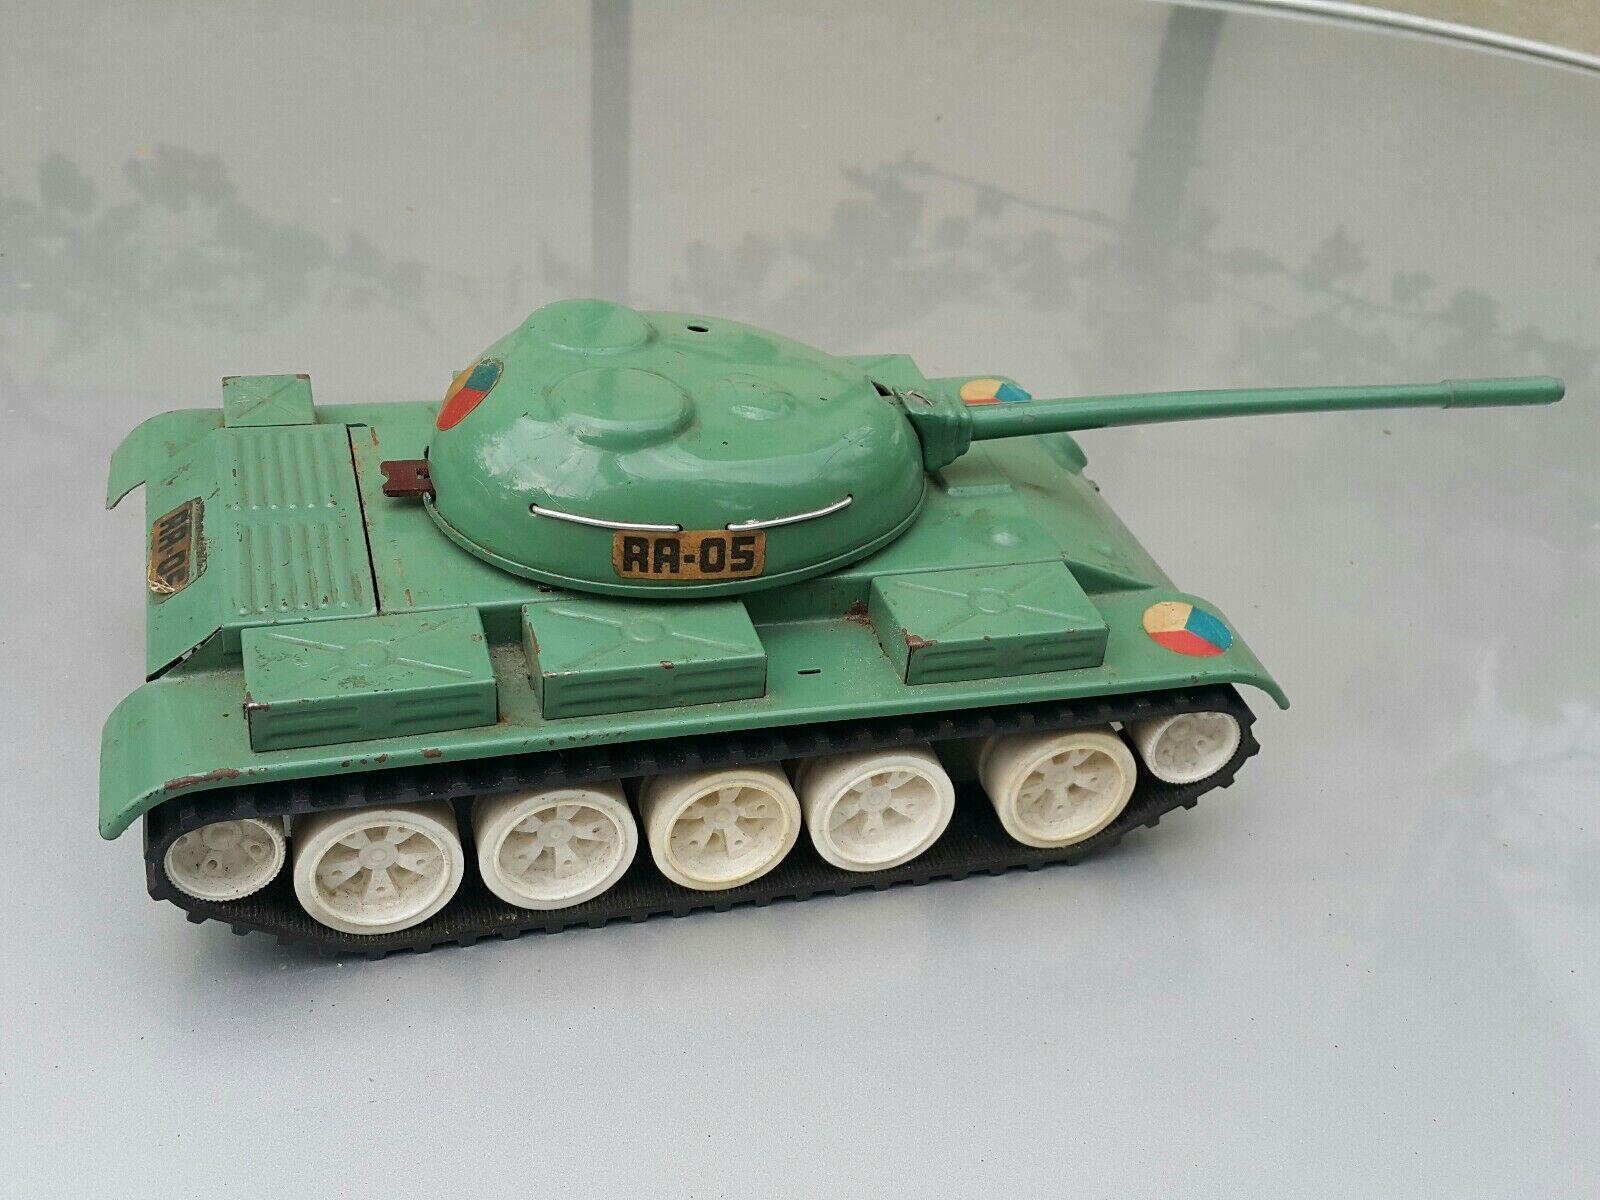 VINTAGE TANK ITES RA - 05 TIN MILITARY TOY BATT. OPERAT. CZECH RUSSIAN ARMY IGRA